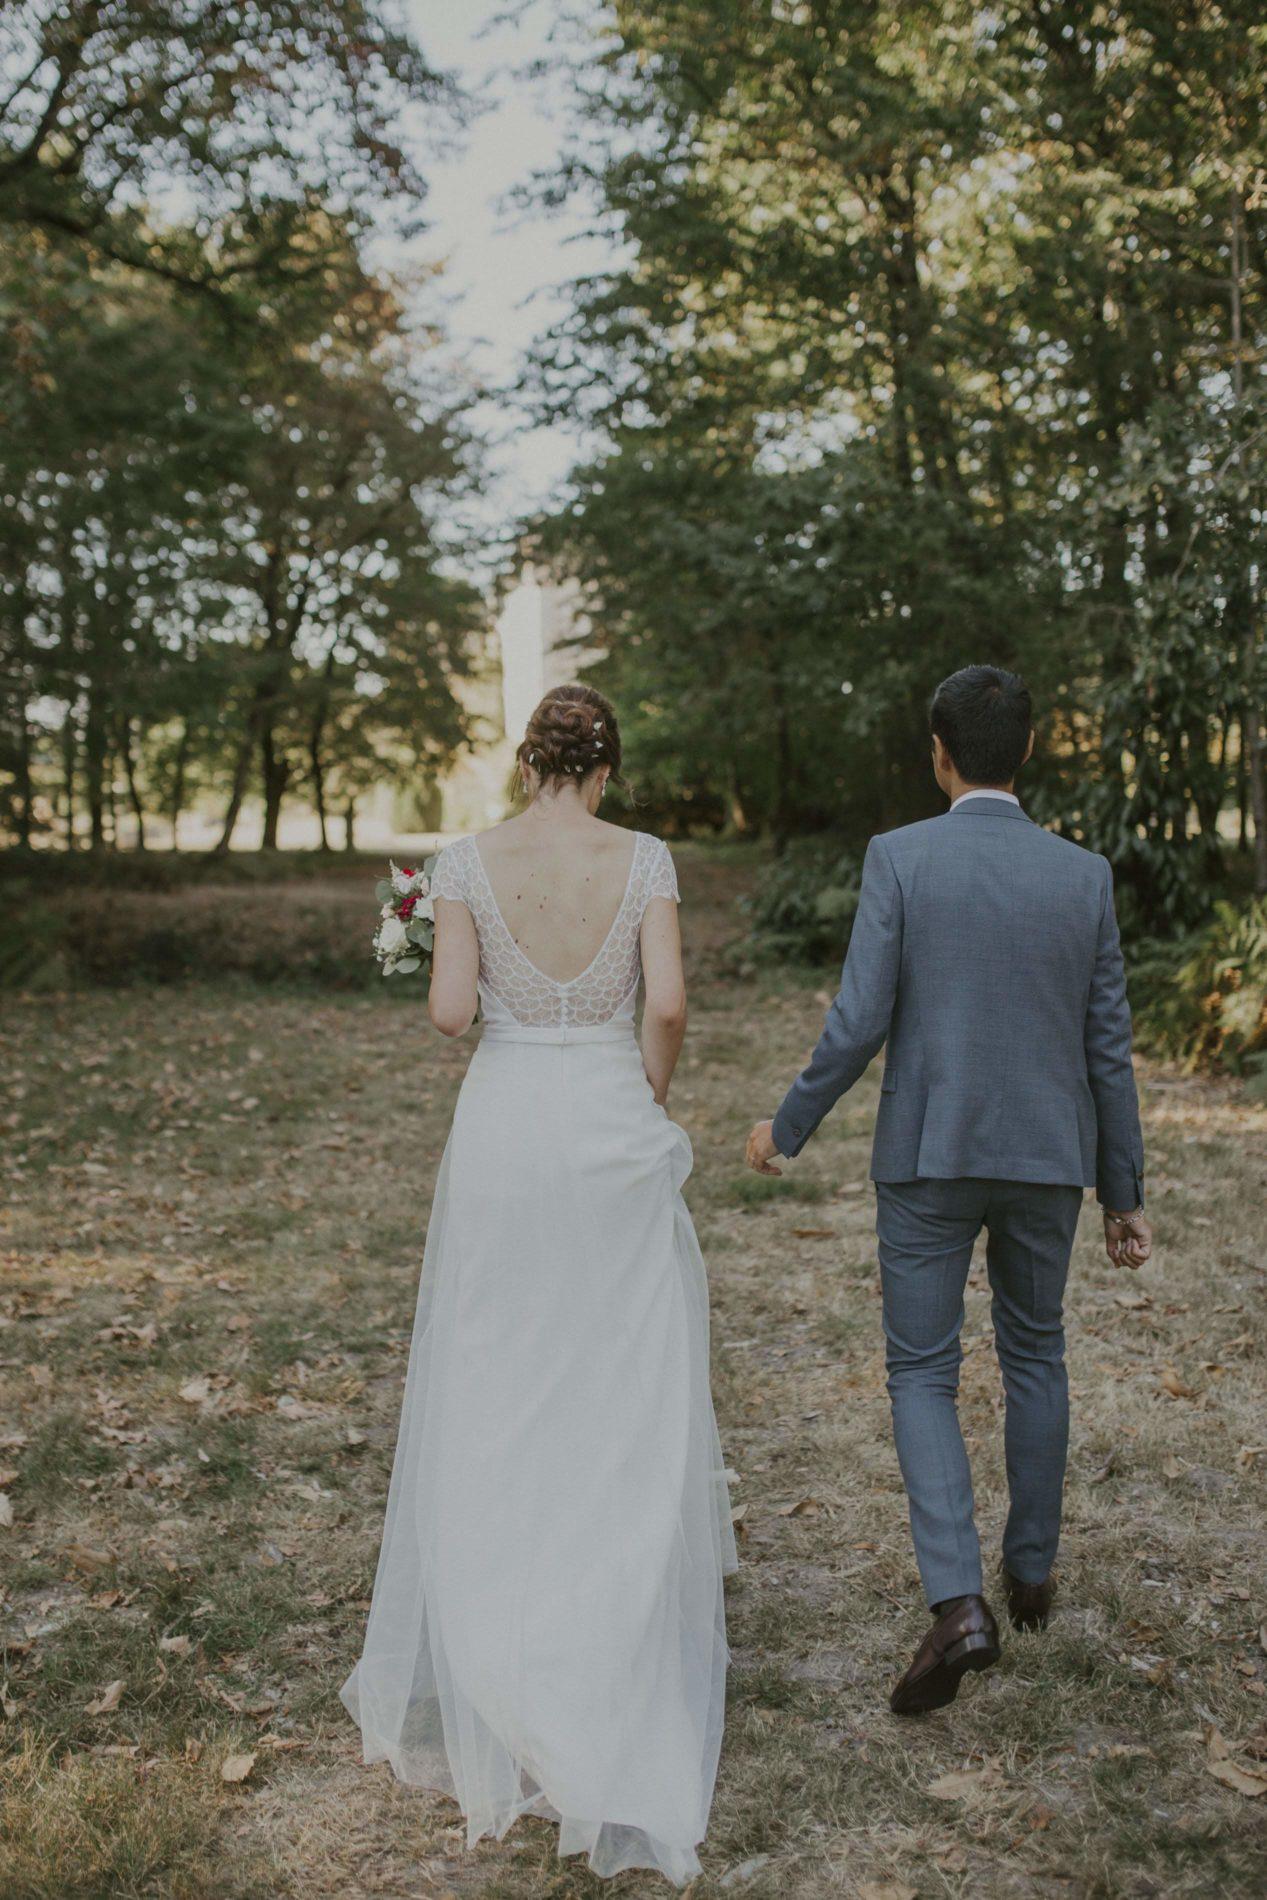 0339_03-CelineSereivuth-340-obonheurdesdames-decoration-mariage-location-Jordane-Chaillou